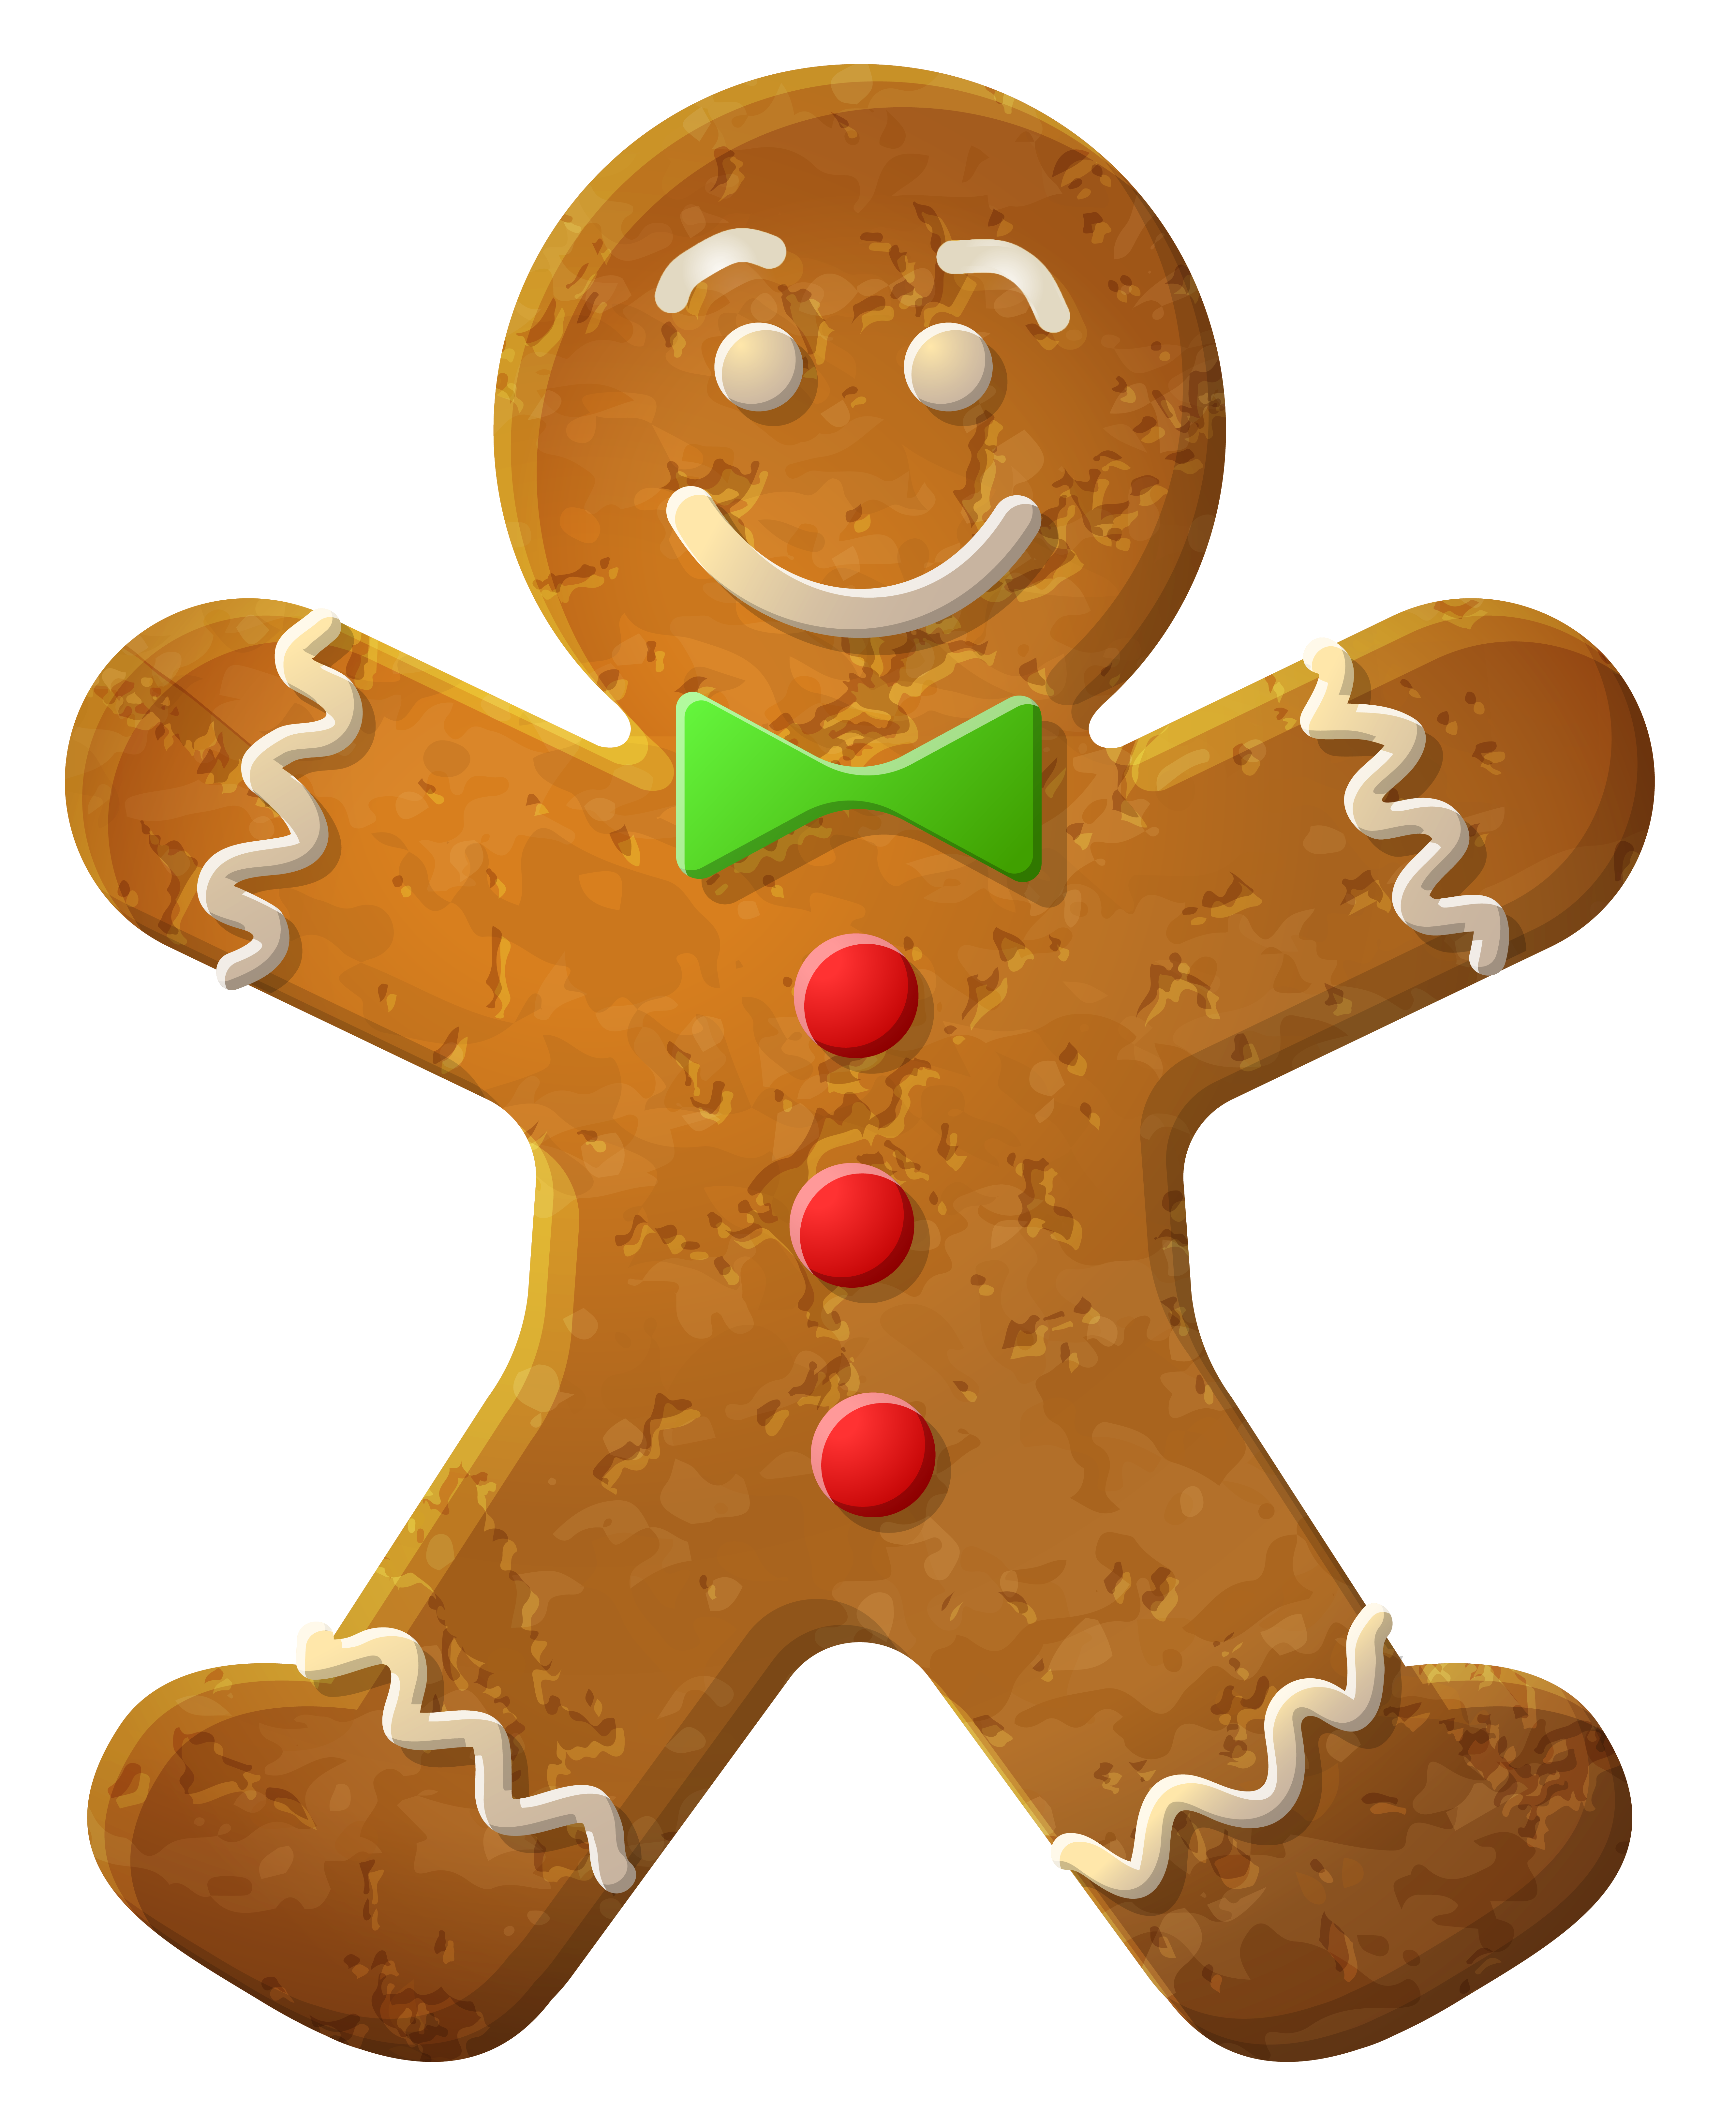 5325x6480 Gingerbread Man Ornament Png Clip Art Imageu200b Gallery